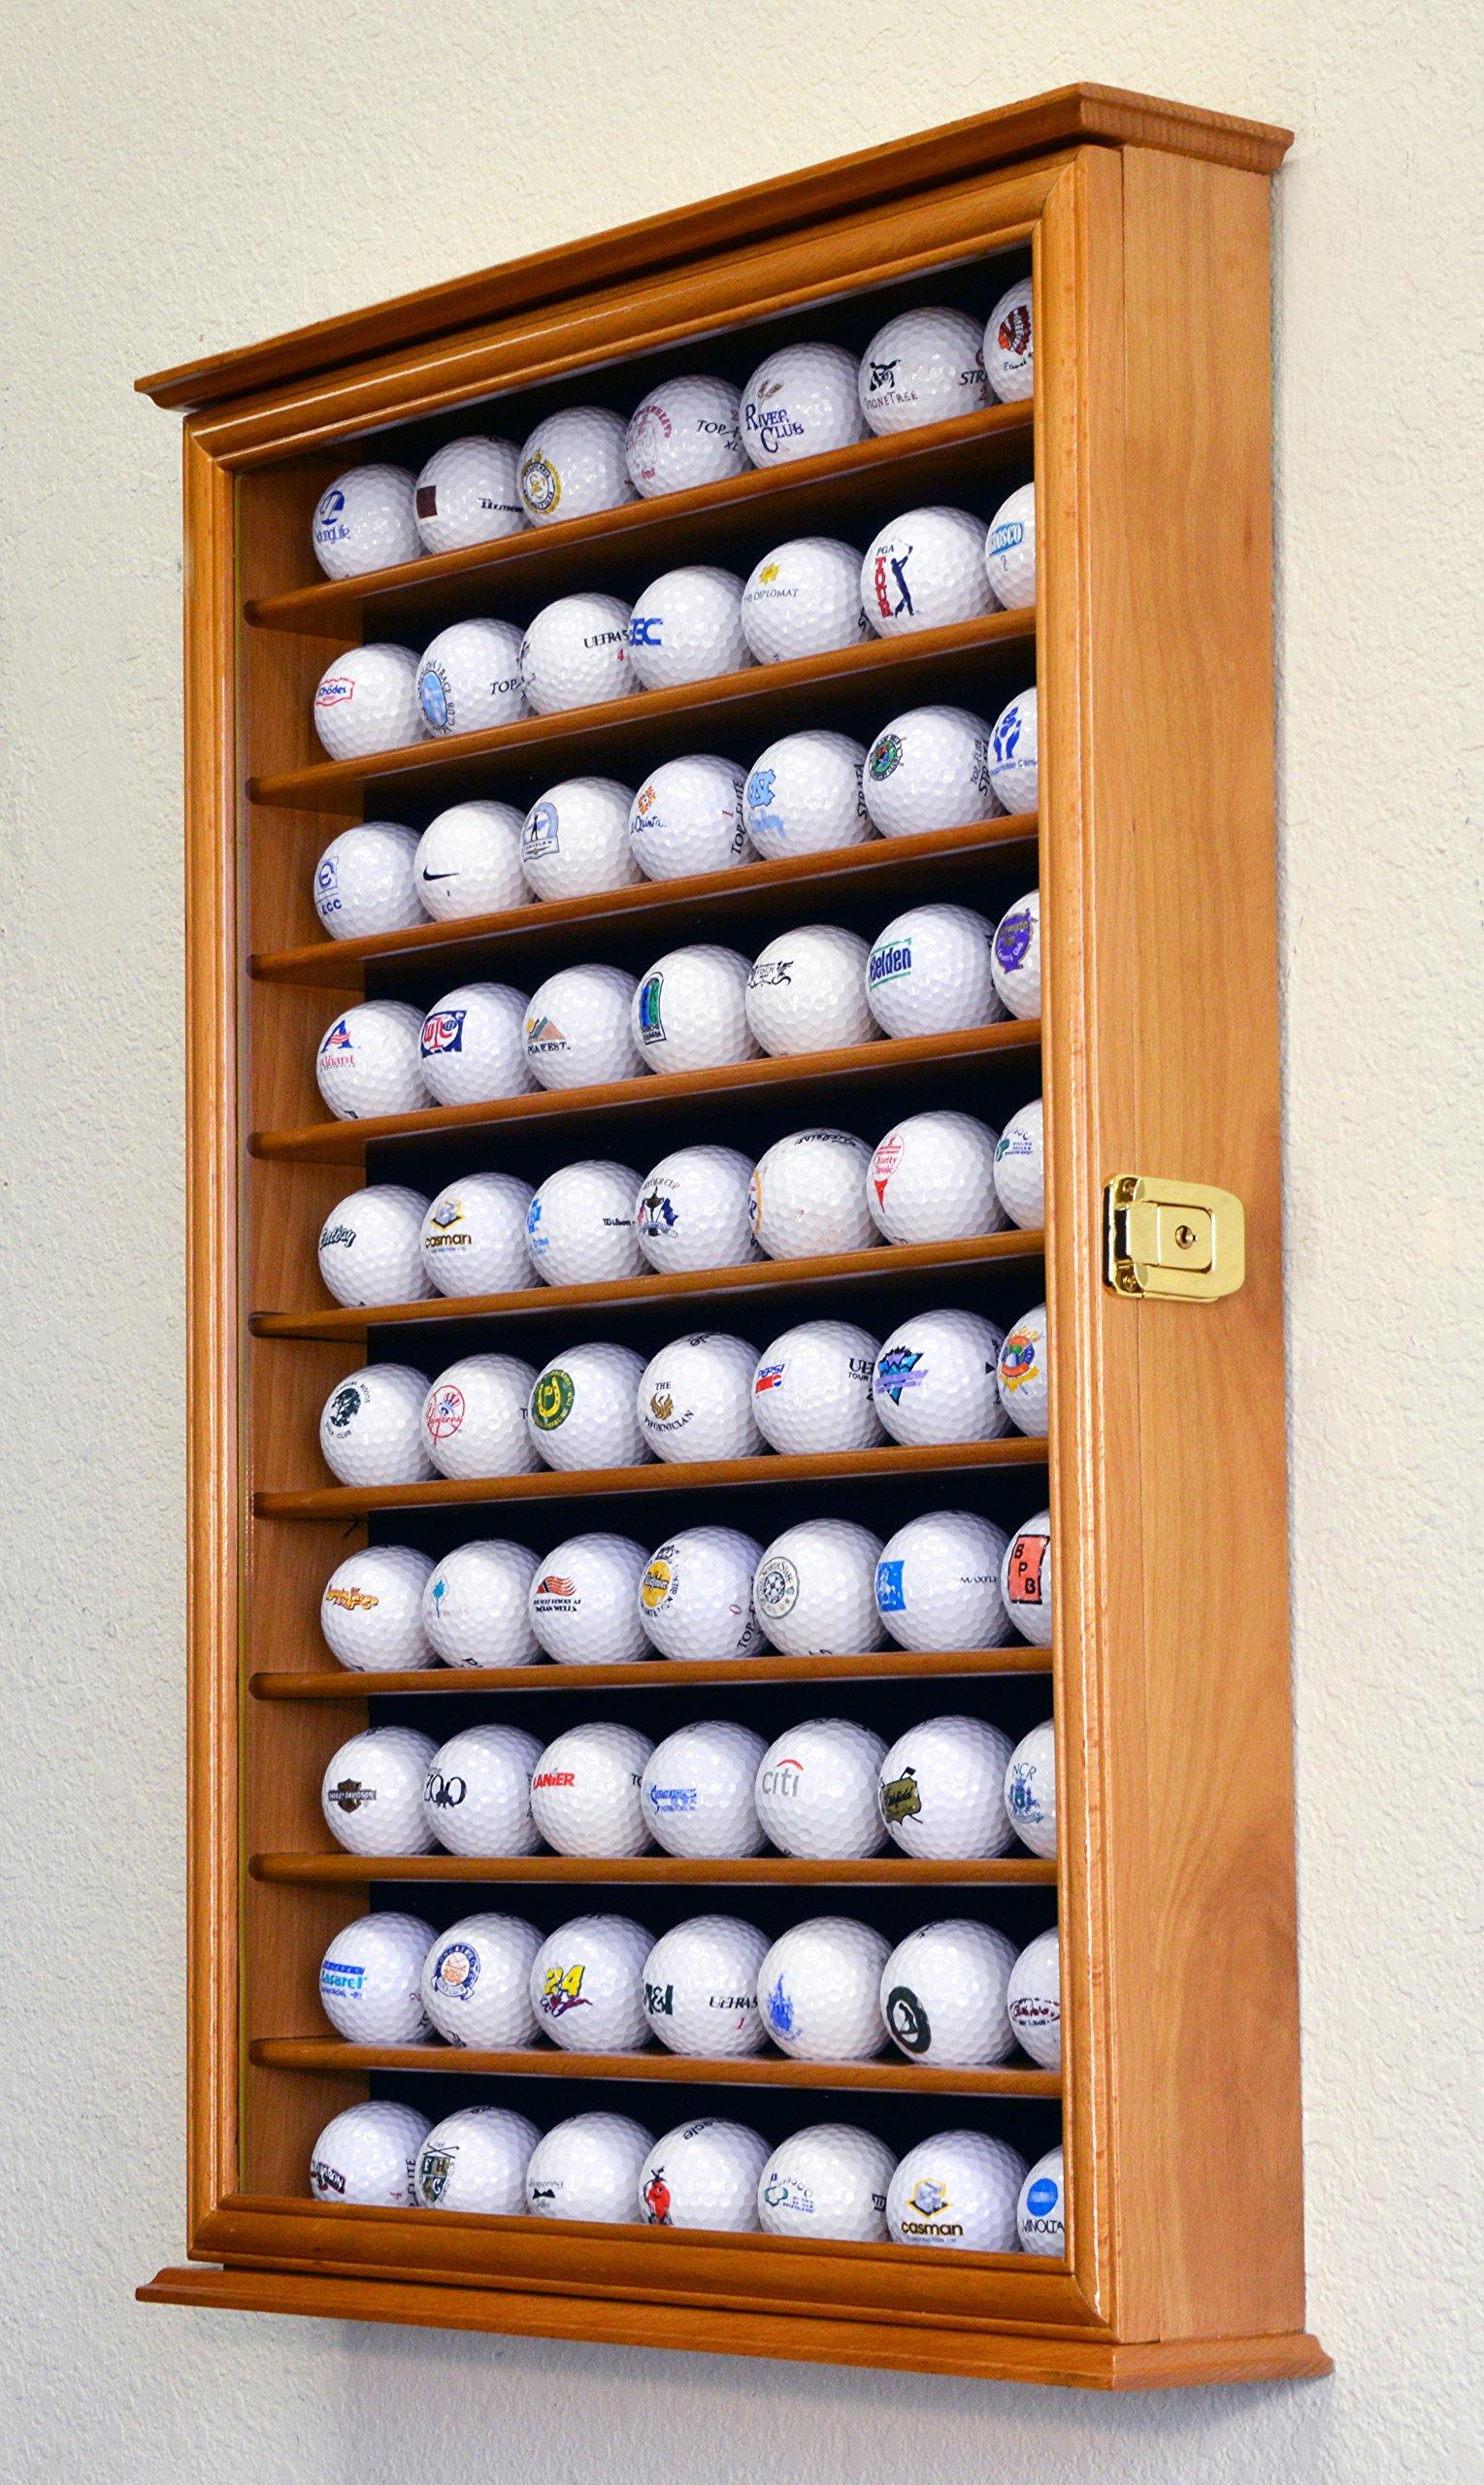 70 Golf Ball Display Case Cabinet Holder Wall Rack w/ UV Protection -Oak by sfDisplay (Image #3)